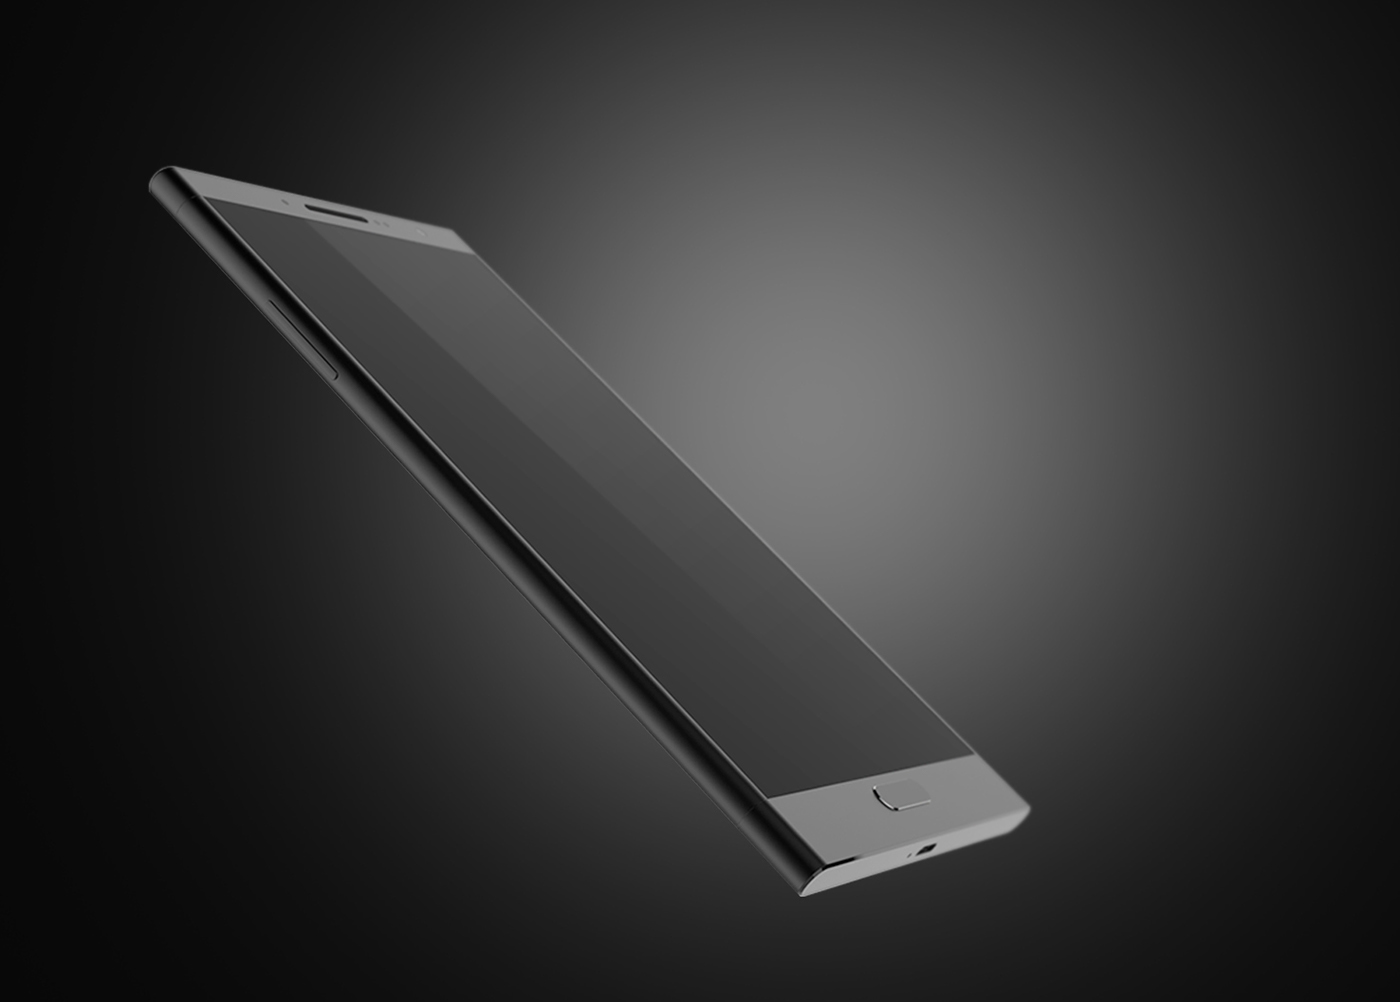 Samsung galaxy concept phone product sadi industrial